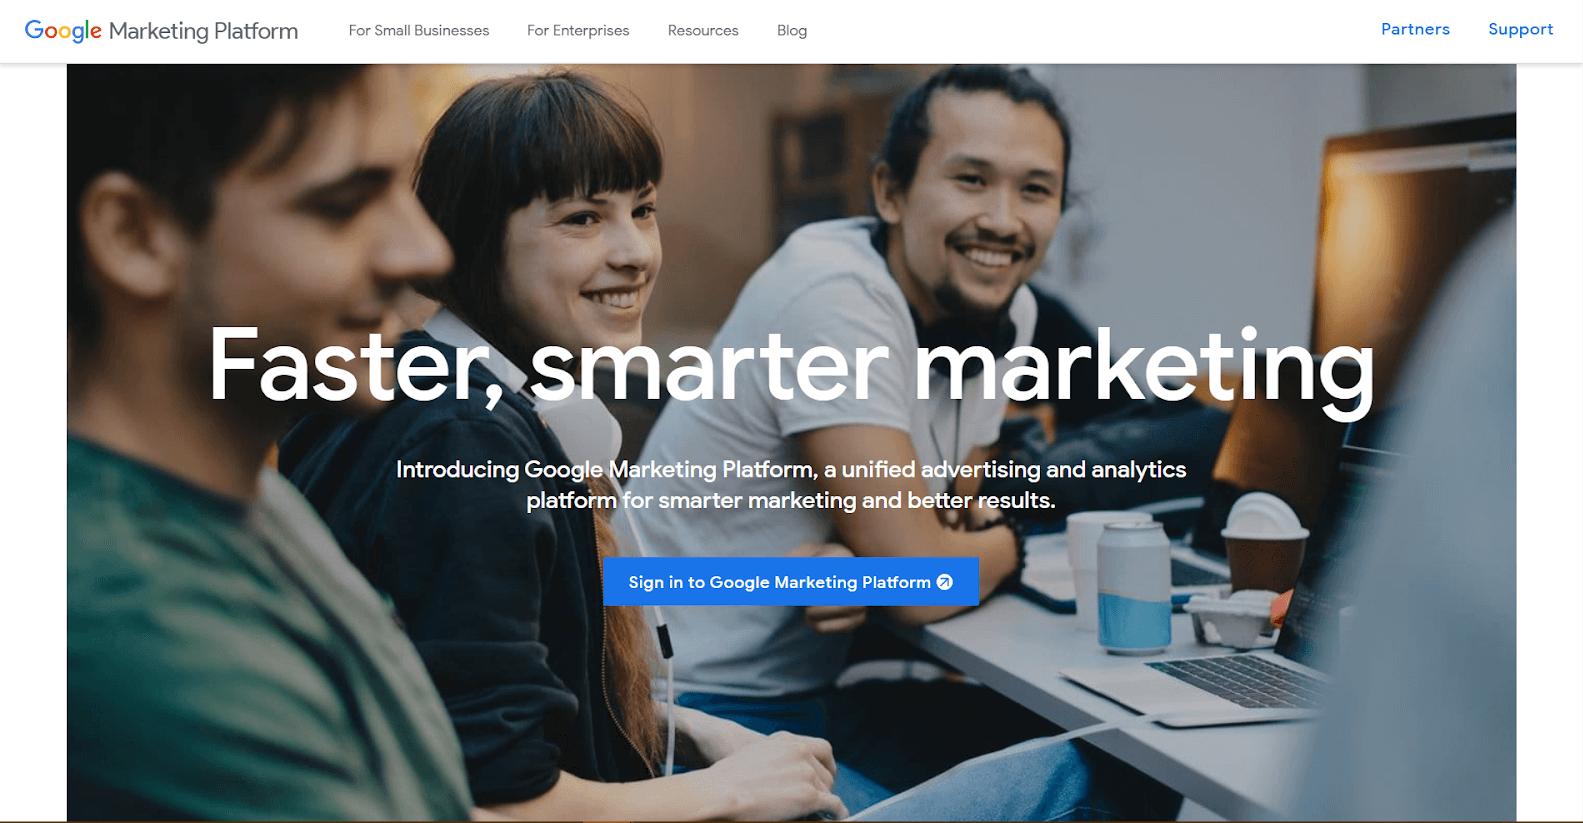 Google Marketing Platform Tools